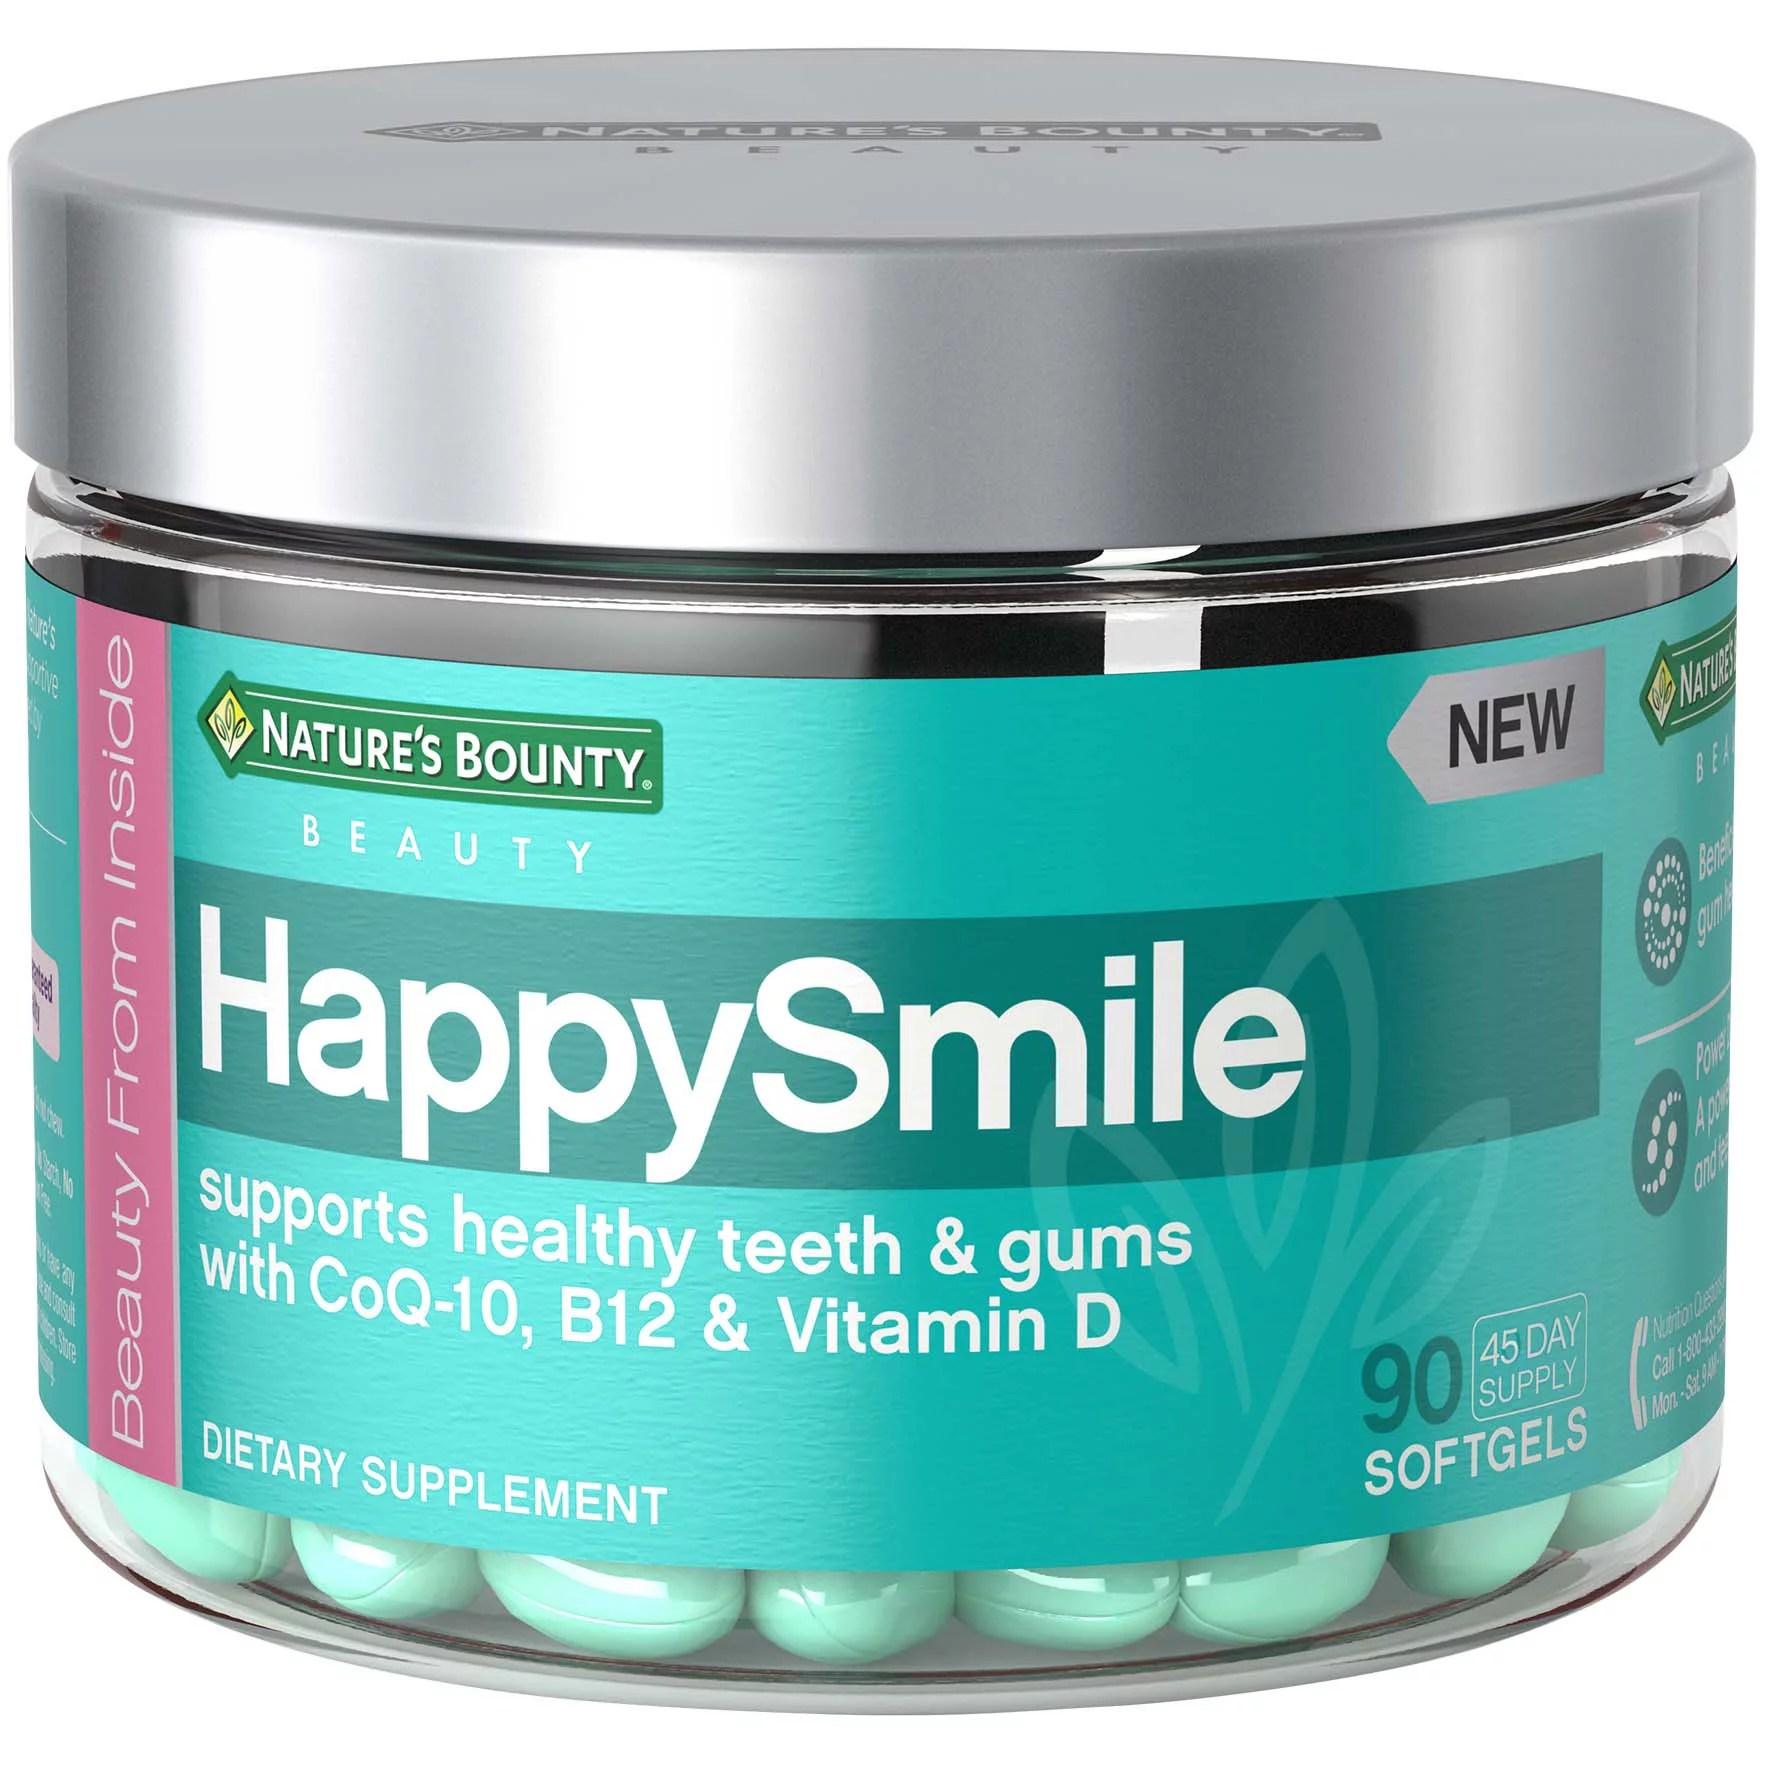 Nature's Bounty Beauty - Nature's Bounty® HappySmile ...